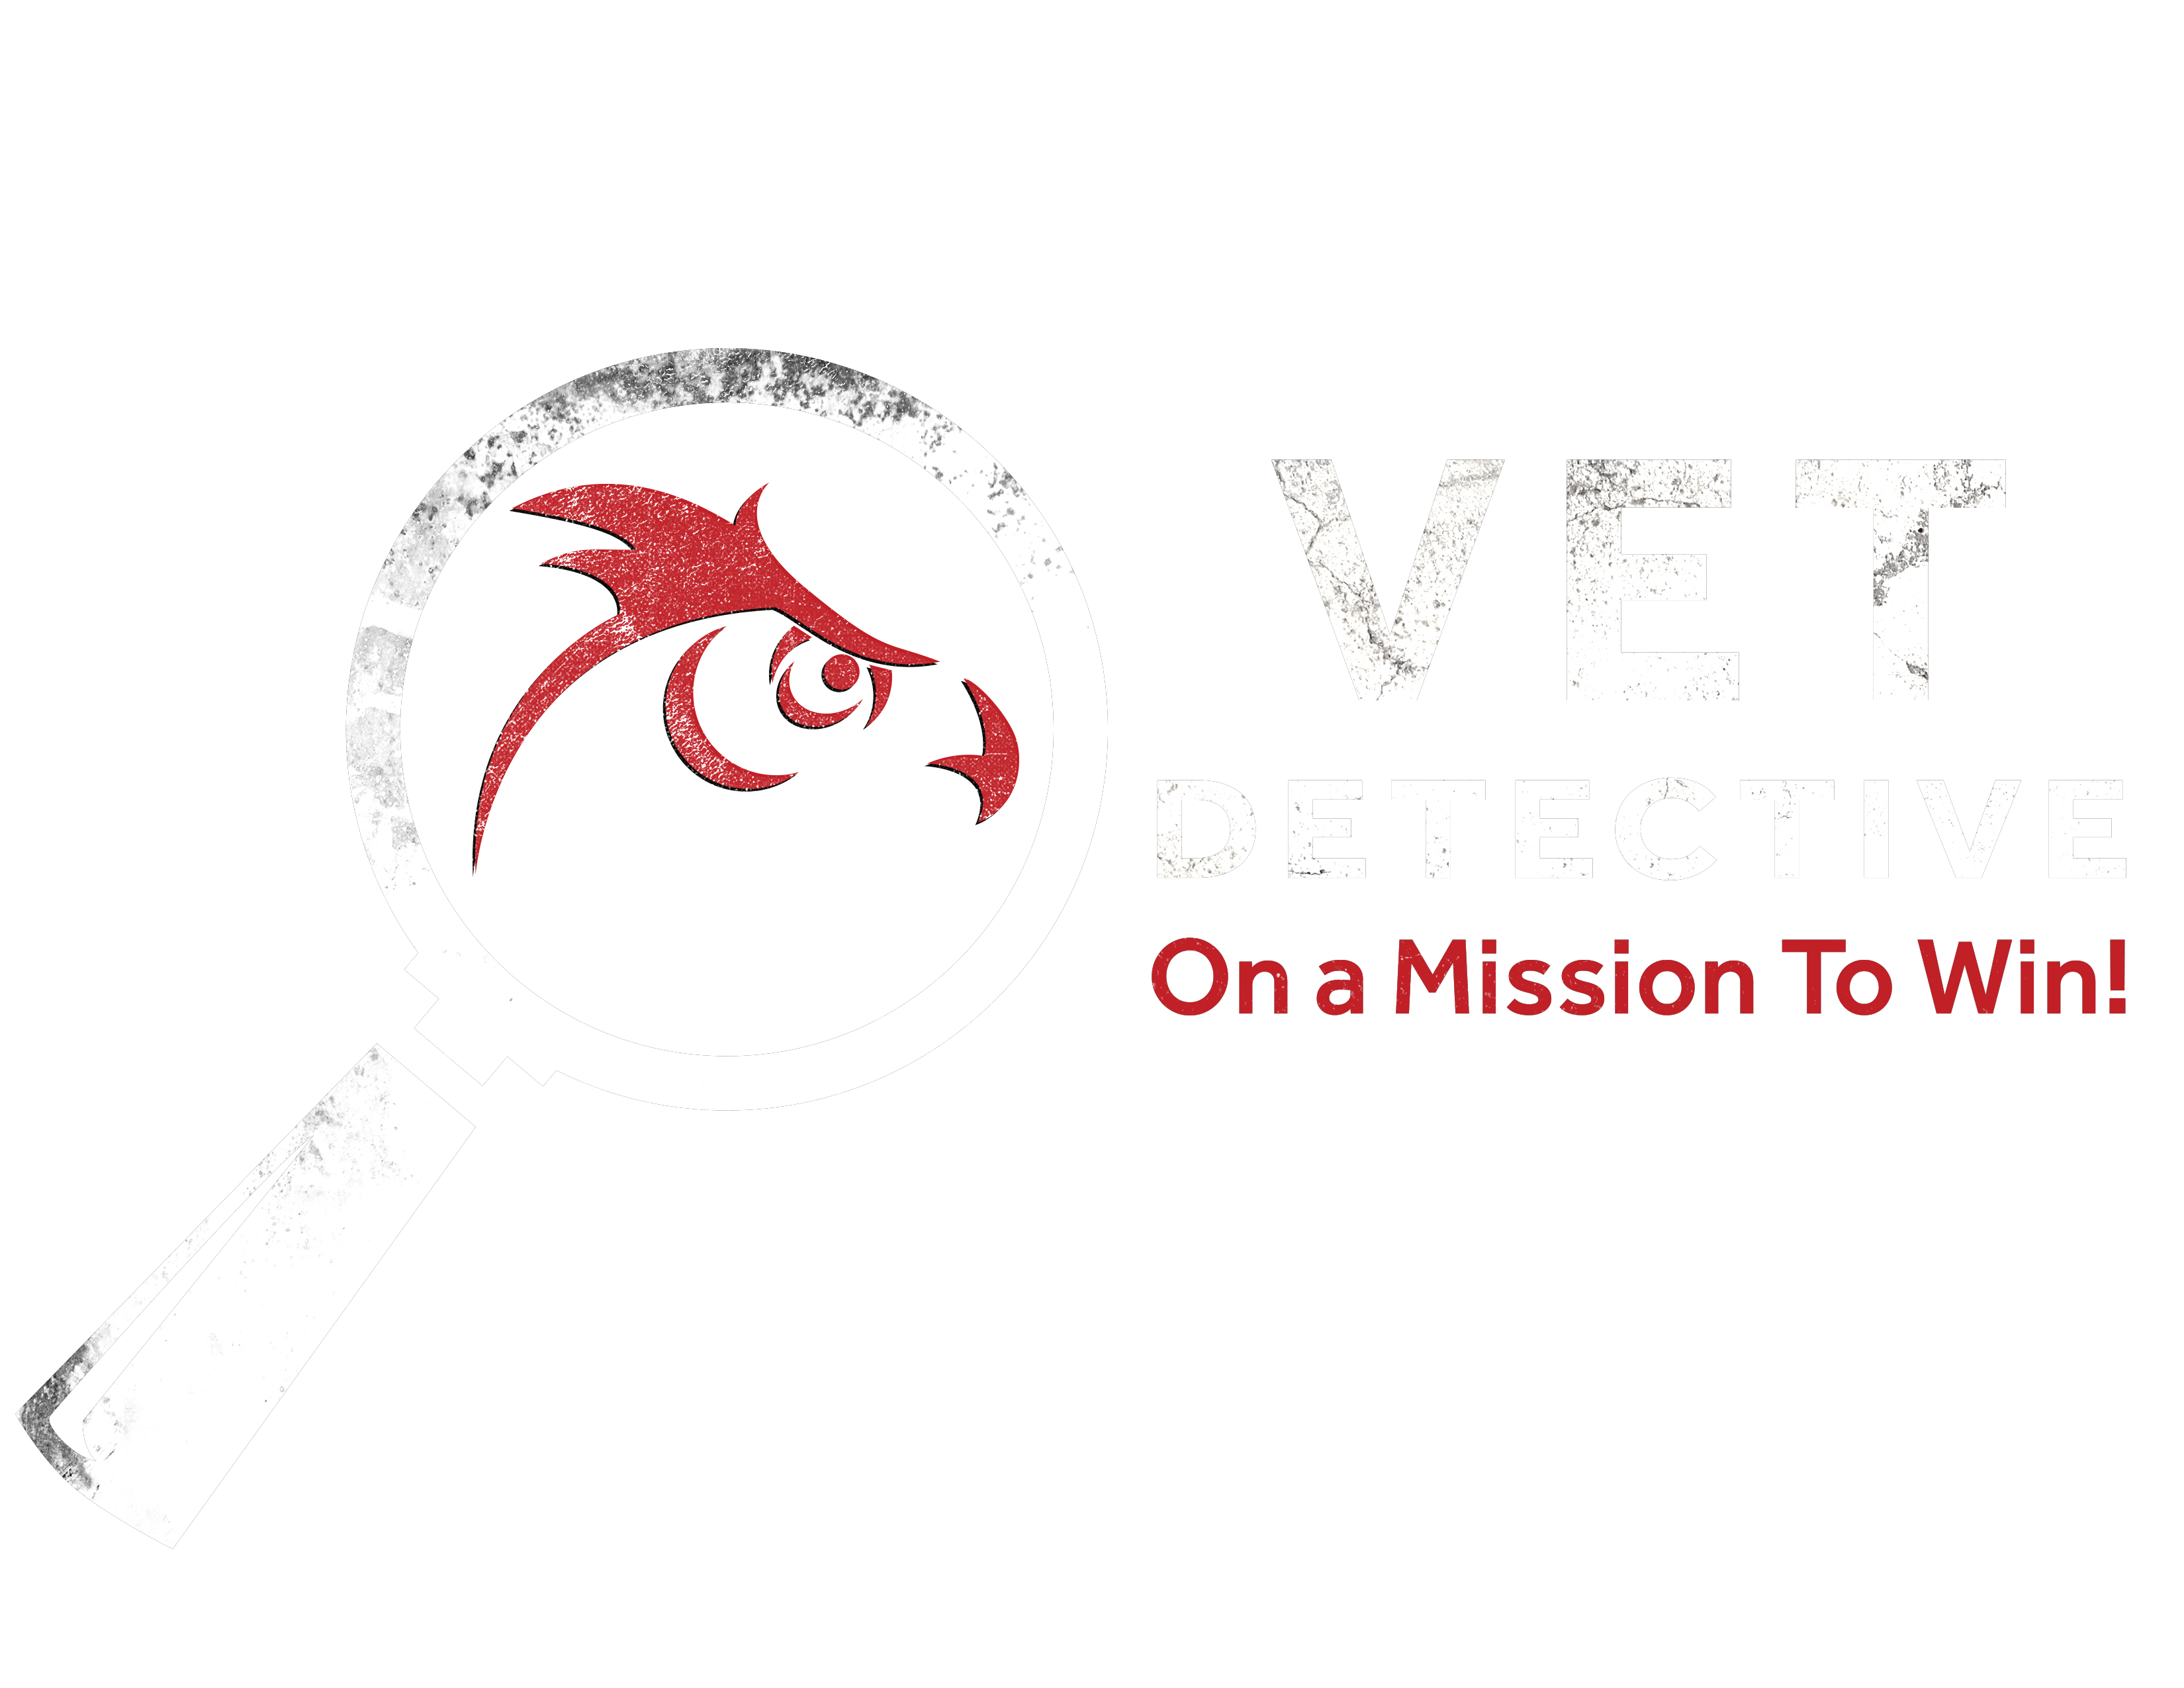 2019-vet-detective-white